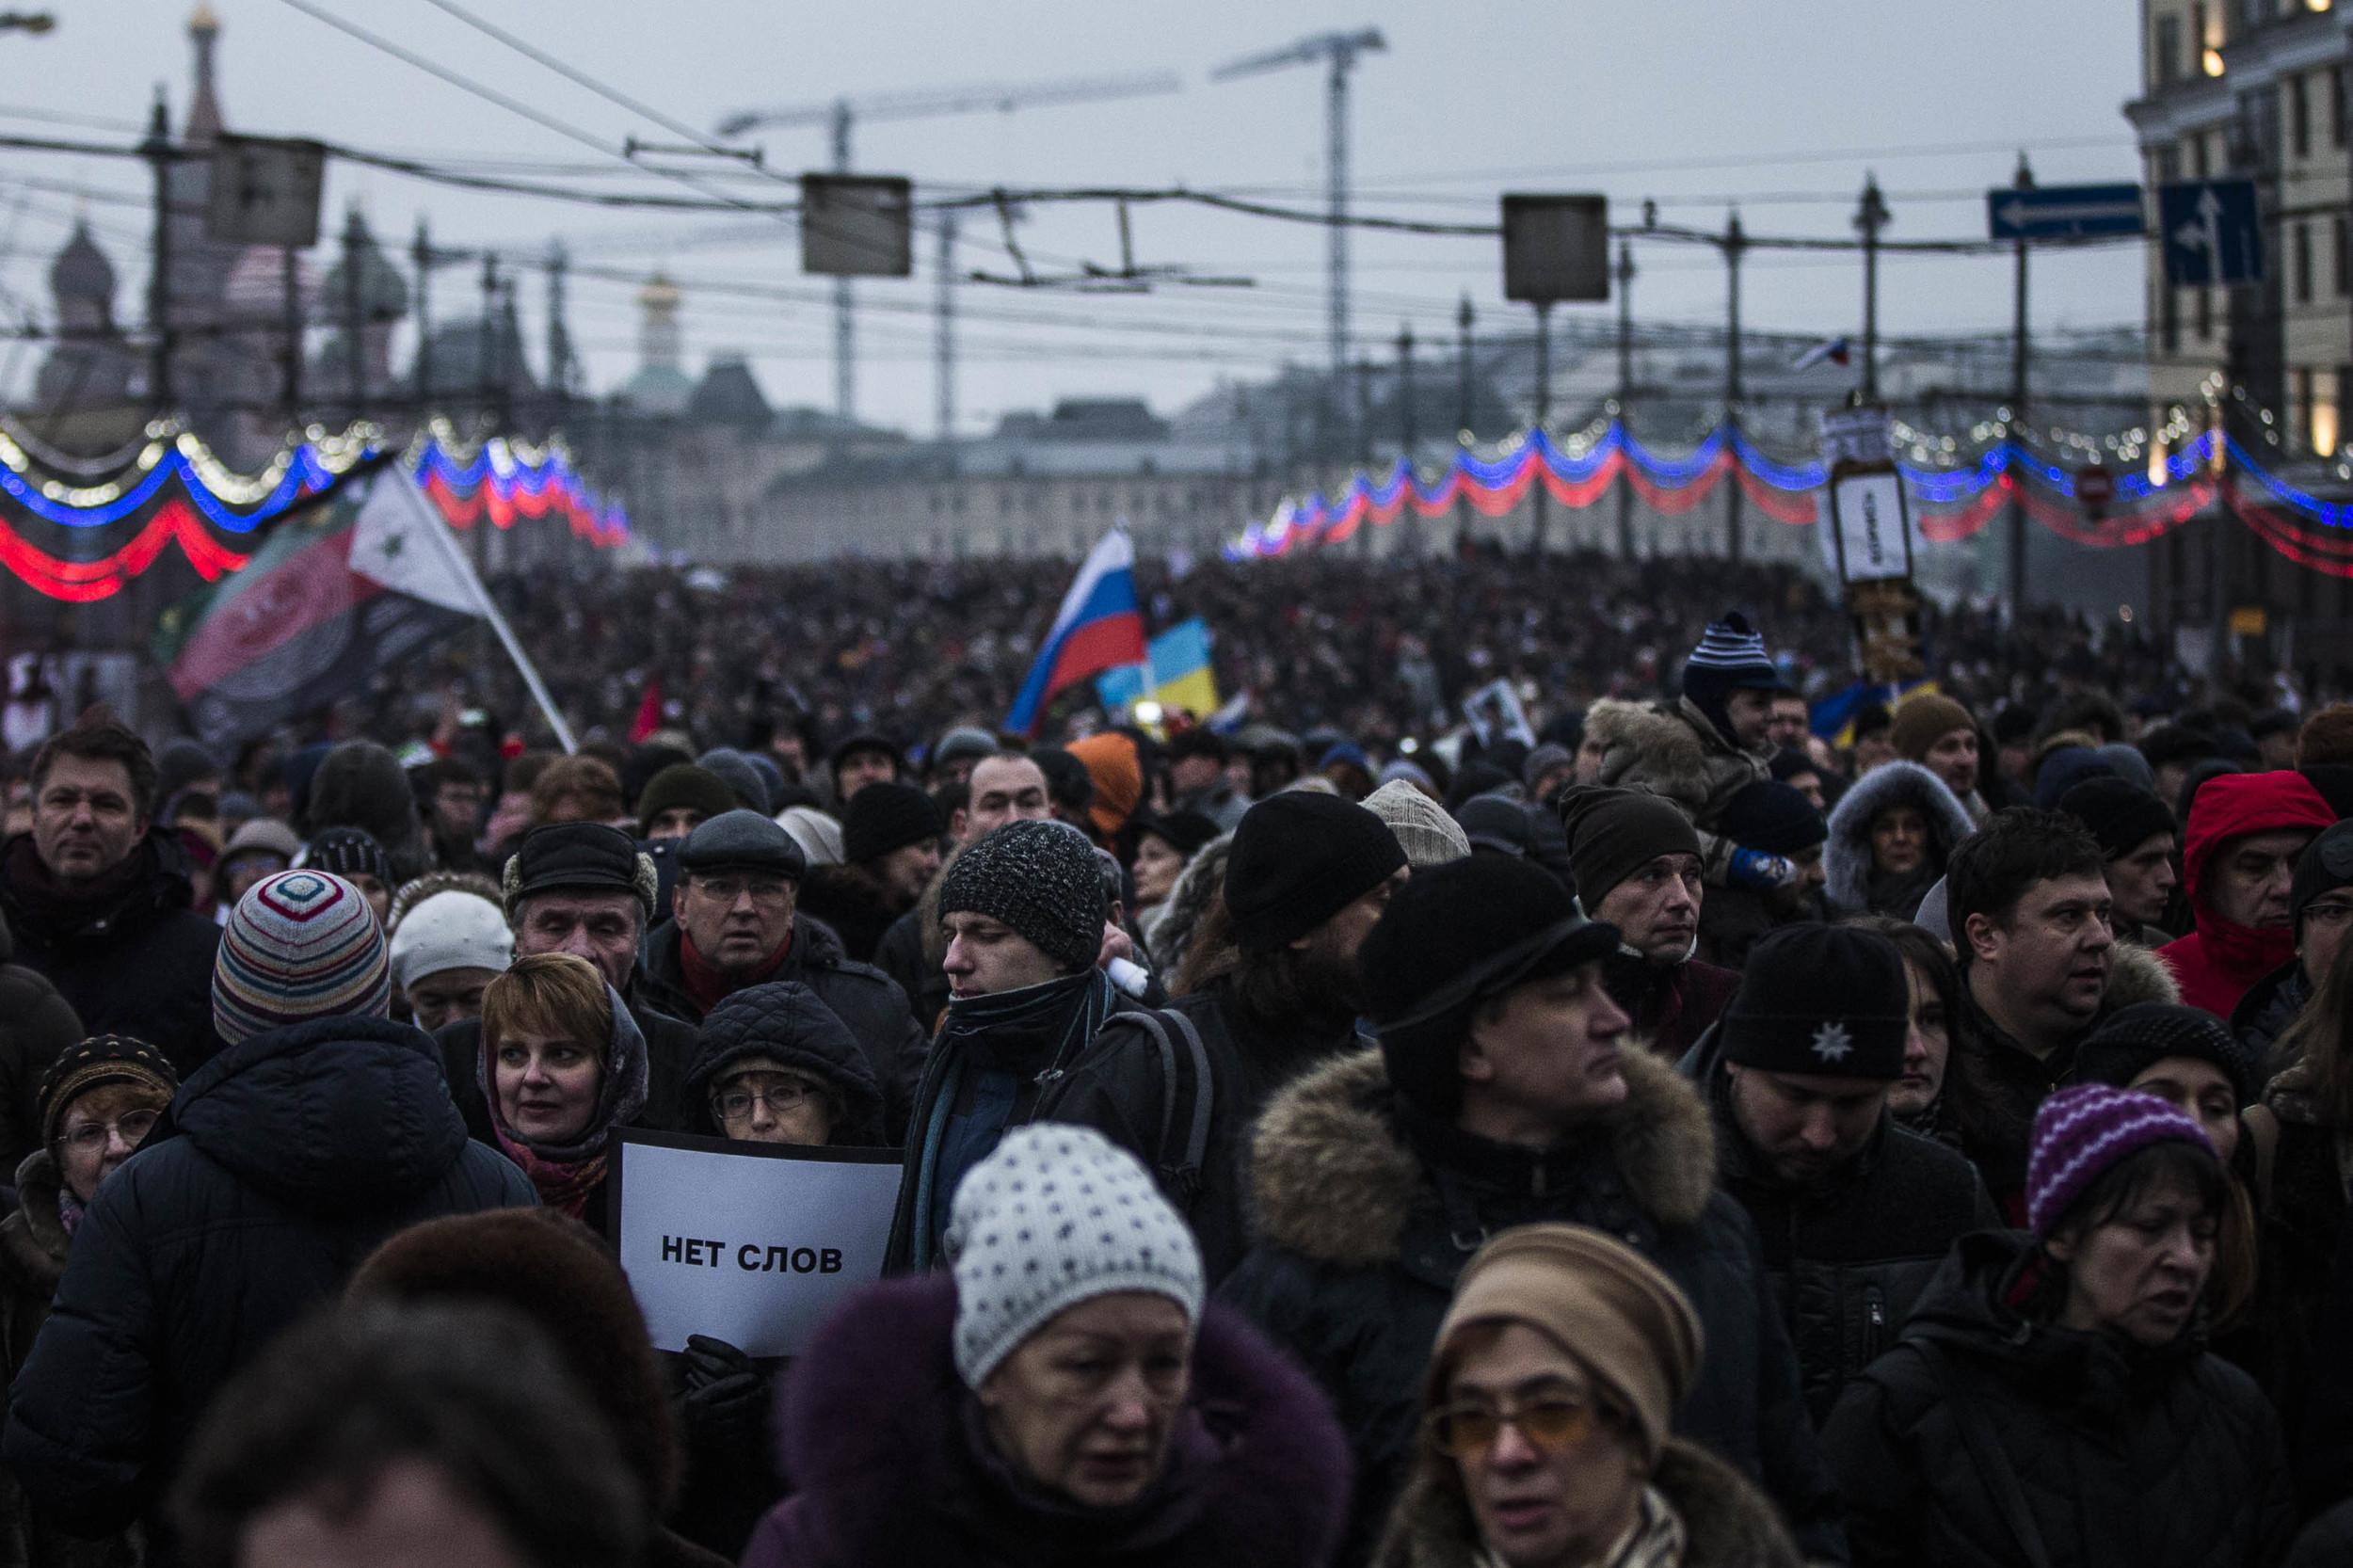 Boris Nemtsov's mourning march. March 2015